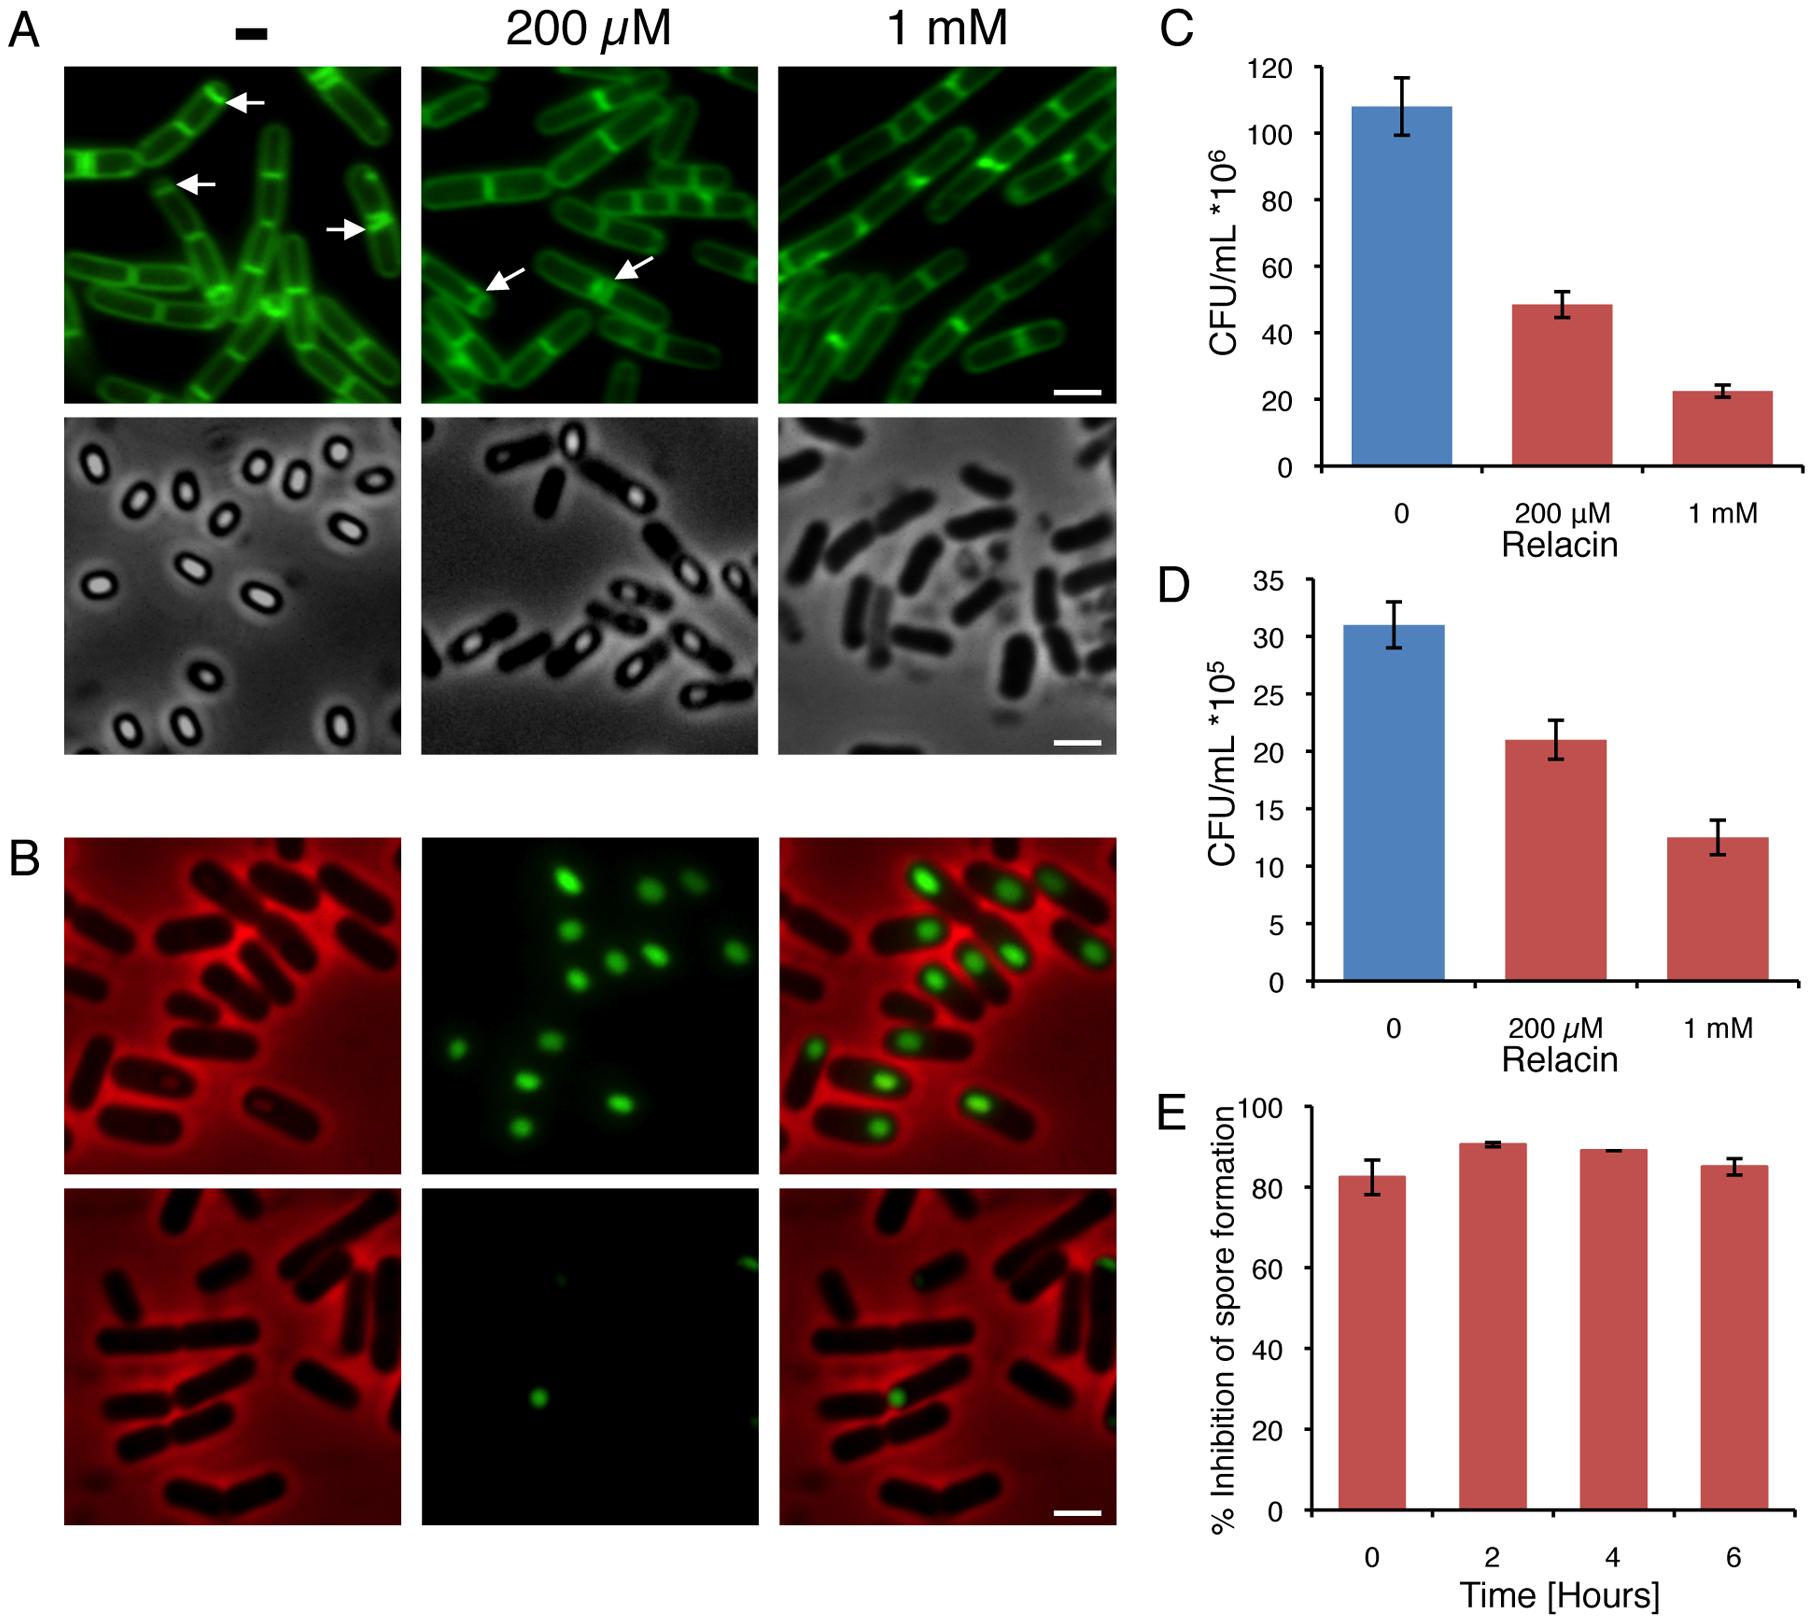 Relacin influences the sporulation process in <i>Bacilli</i>.